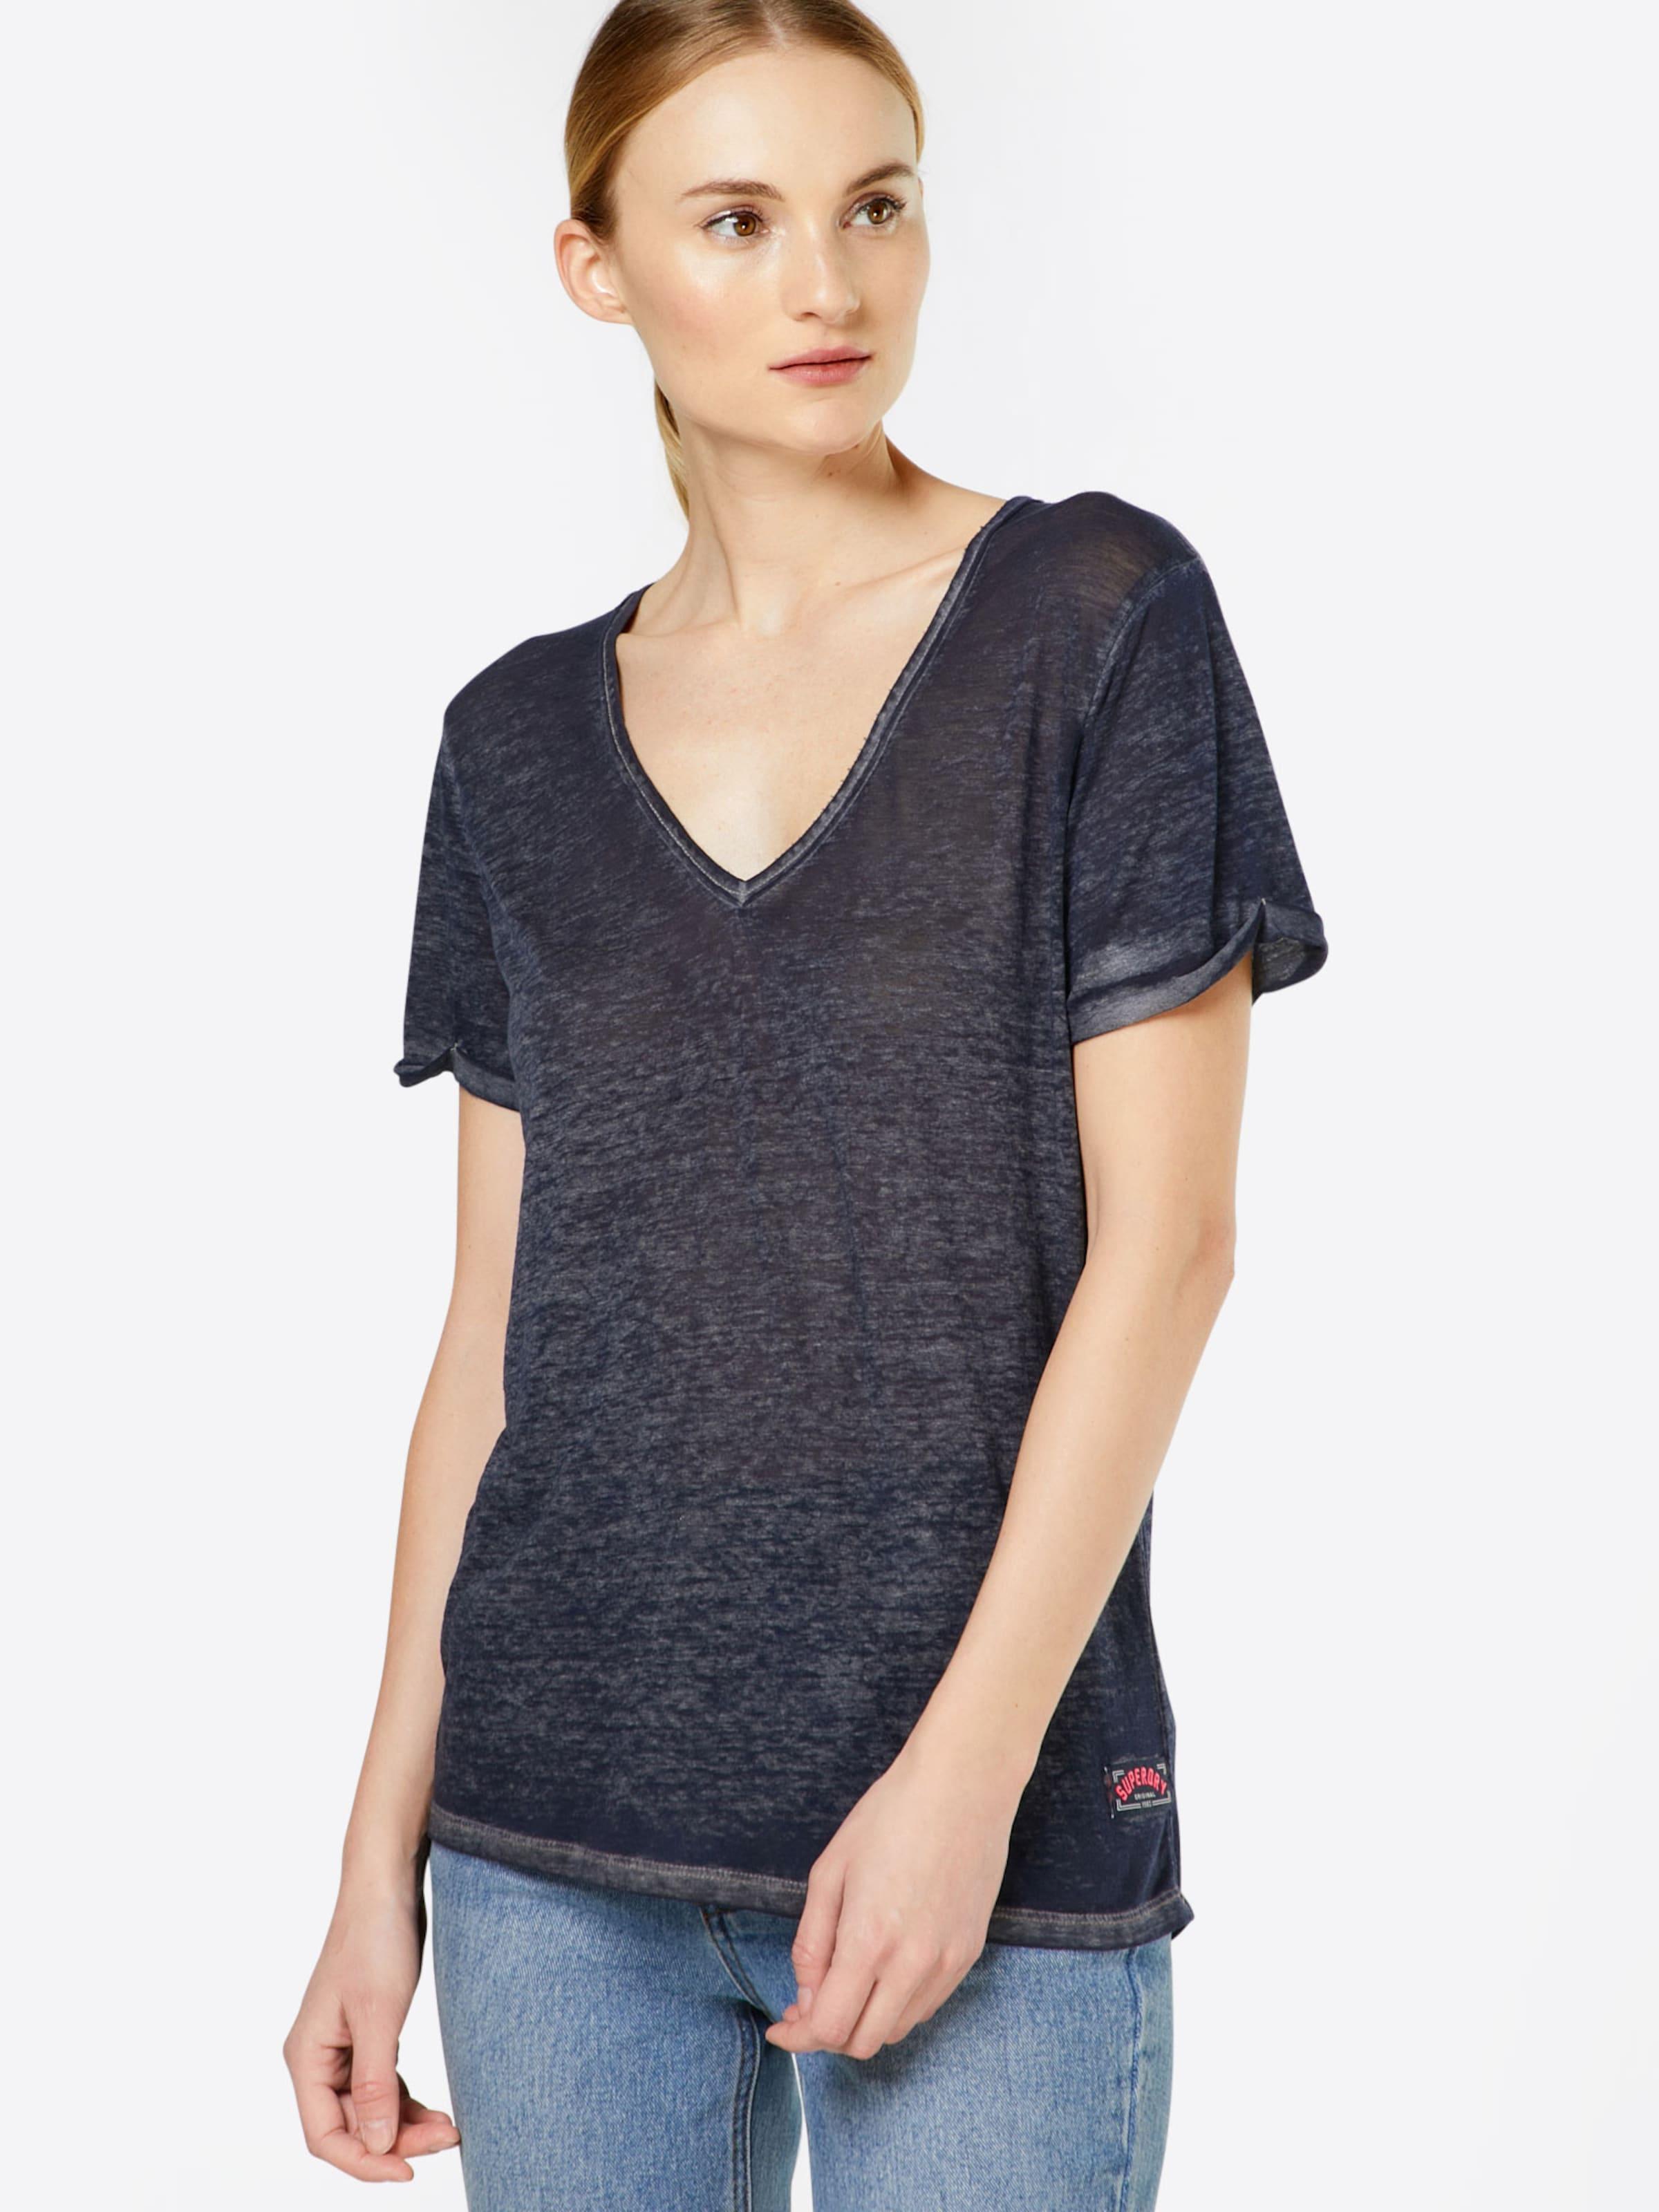 shirt Superdry In T 'burnout' Graumeliert HDeYbW2IE9